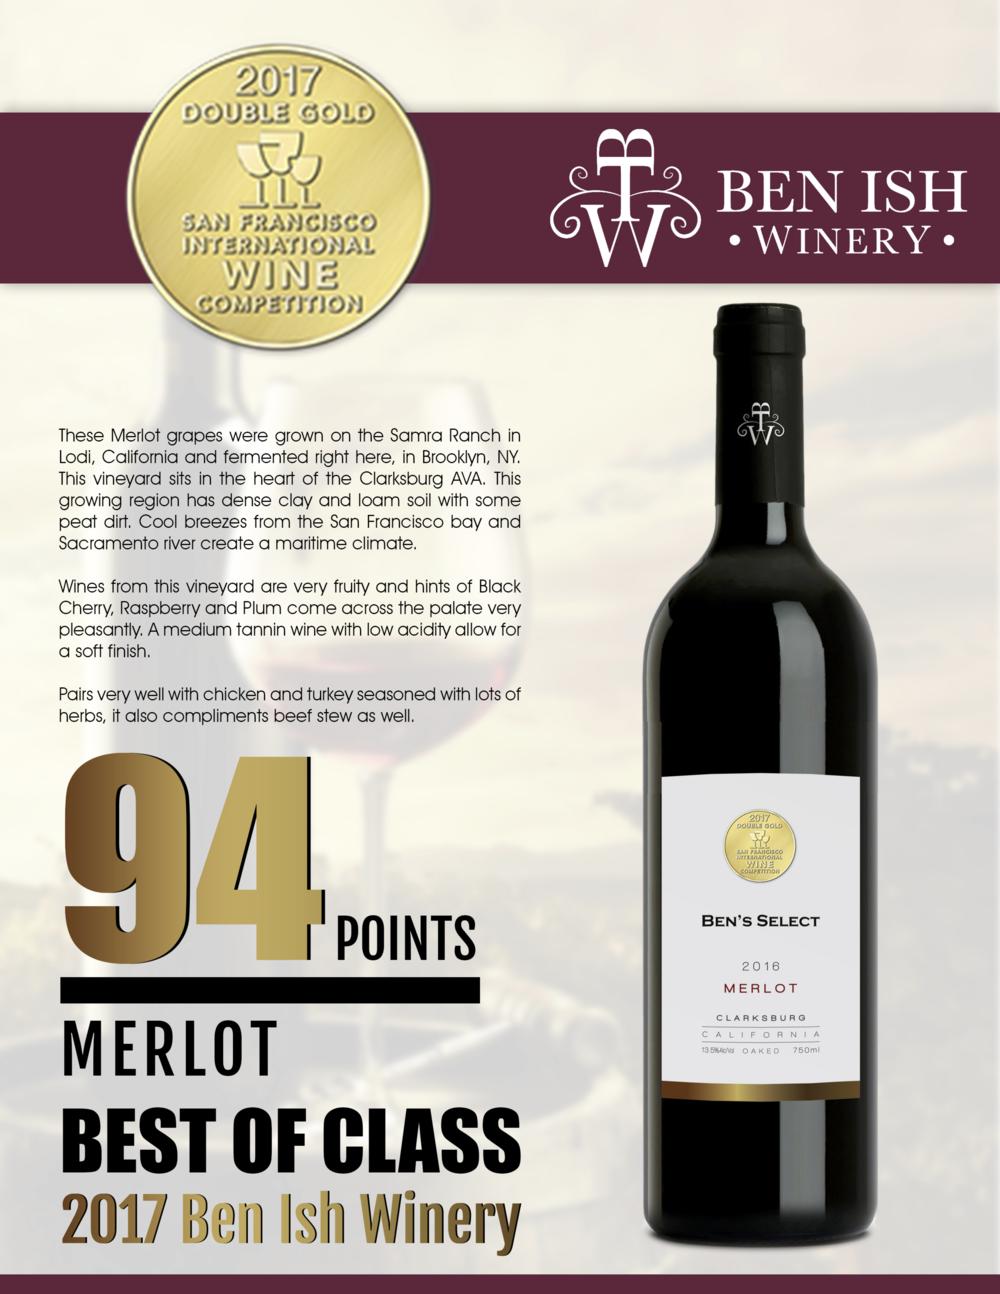 San Fransisco International Wine Competition - 2017 - DOUBLE GOLD medal -2016 Merlot